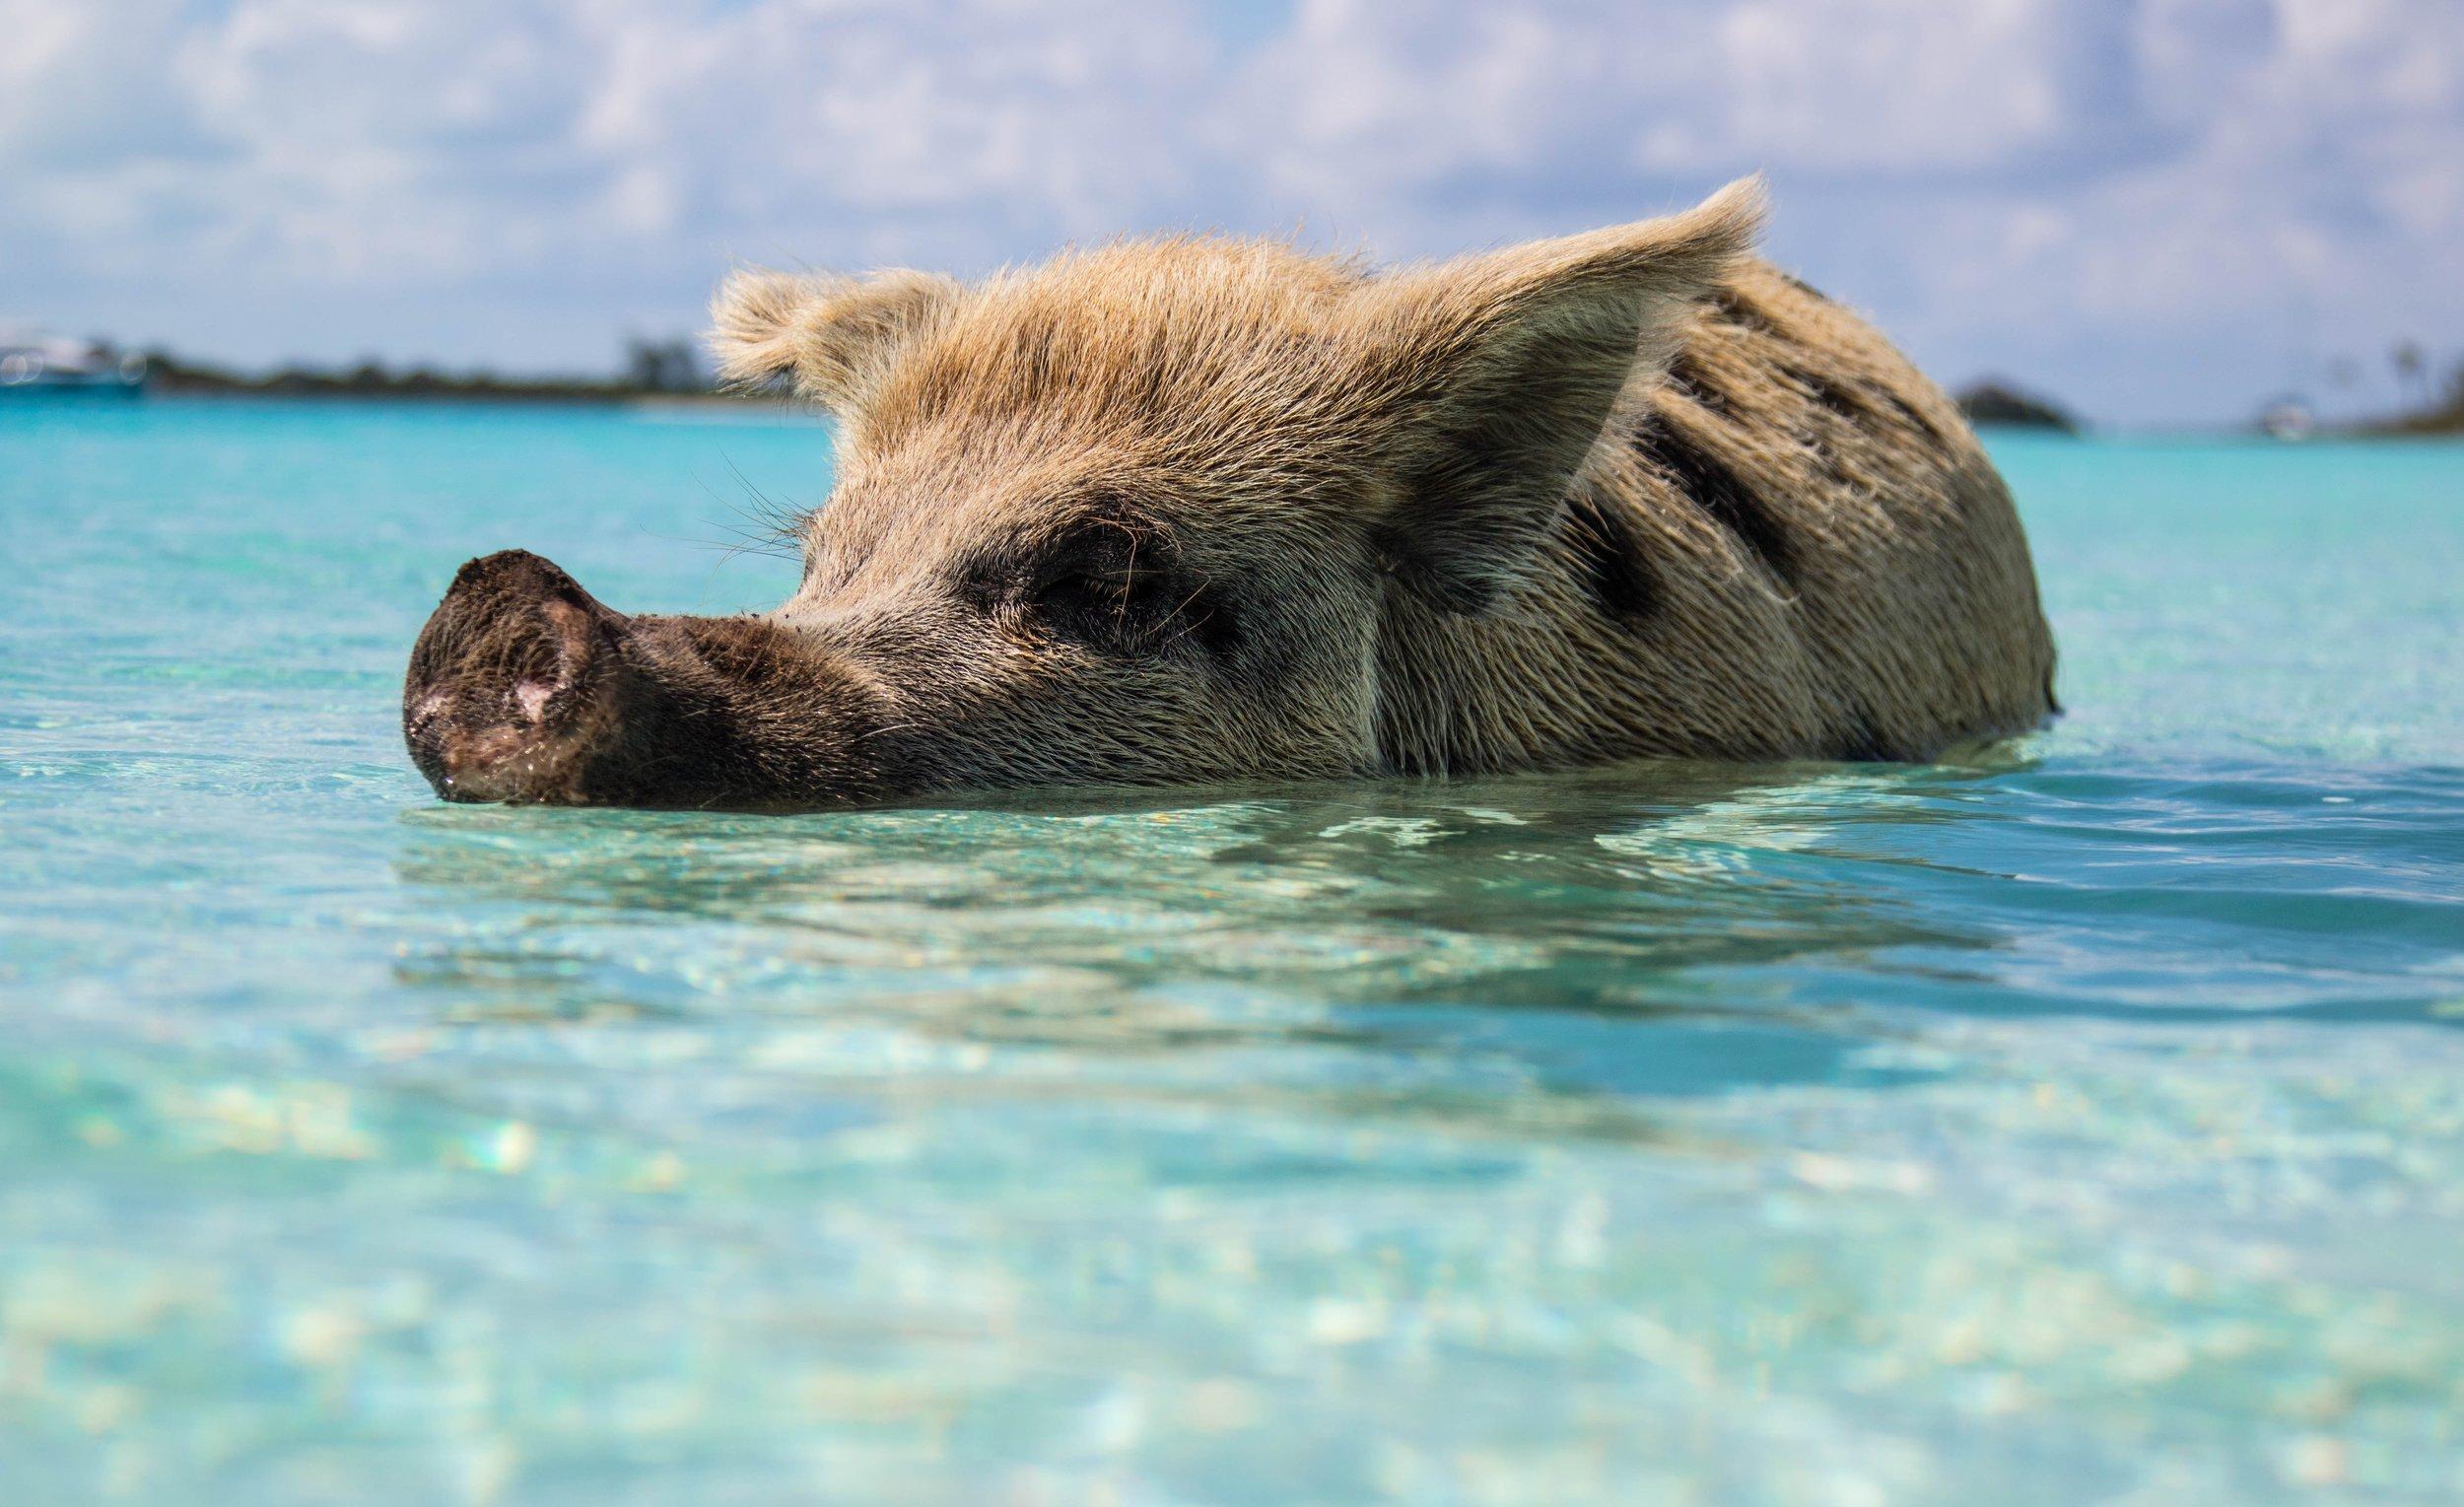 Bahamas (Nassau) - Peak Season: Dec-AprVibe: #Beach #Rest&Relaxation #Adventure #ResortCOMING SOON!